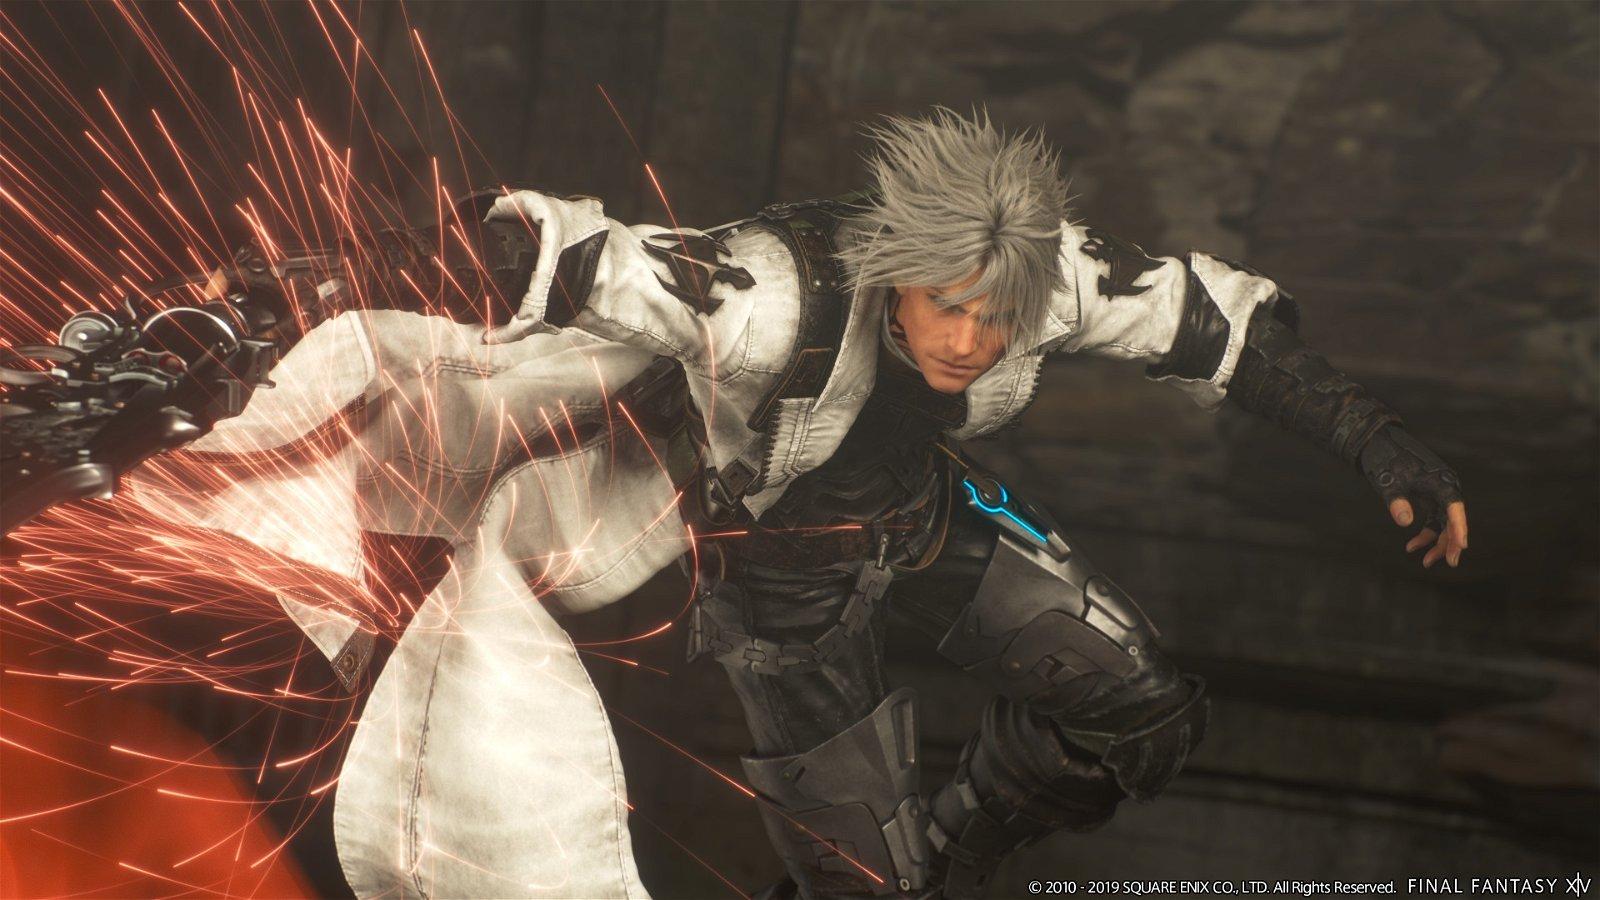 New Final Fantasy XIV: Shadowbringers Details, NieR Automata Collaboration Revealed at Paris Fan Festival 4